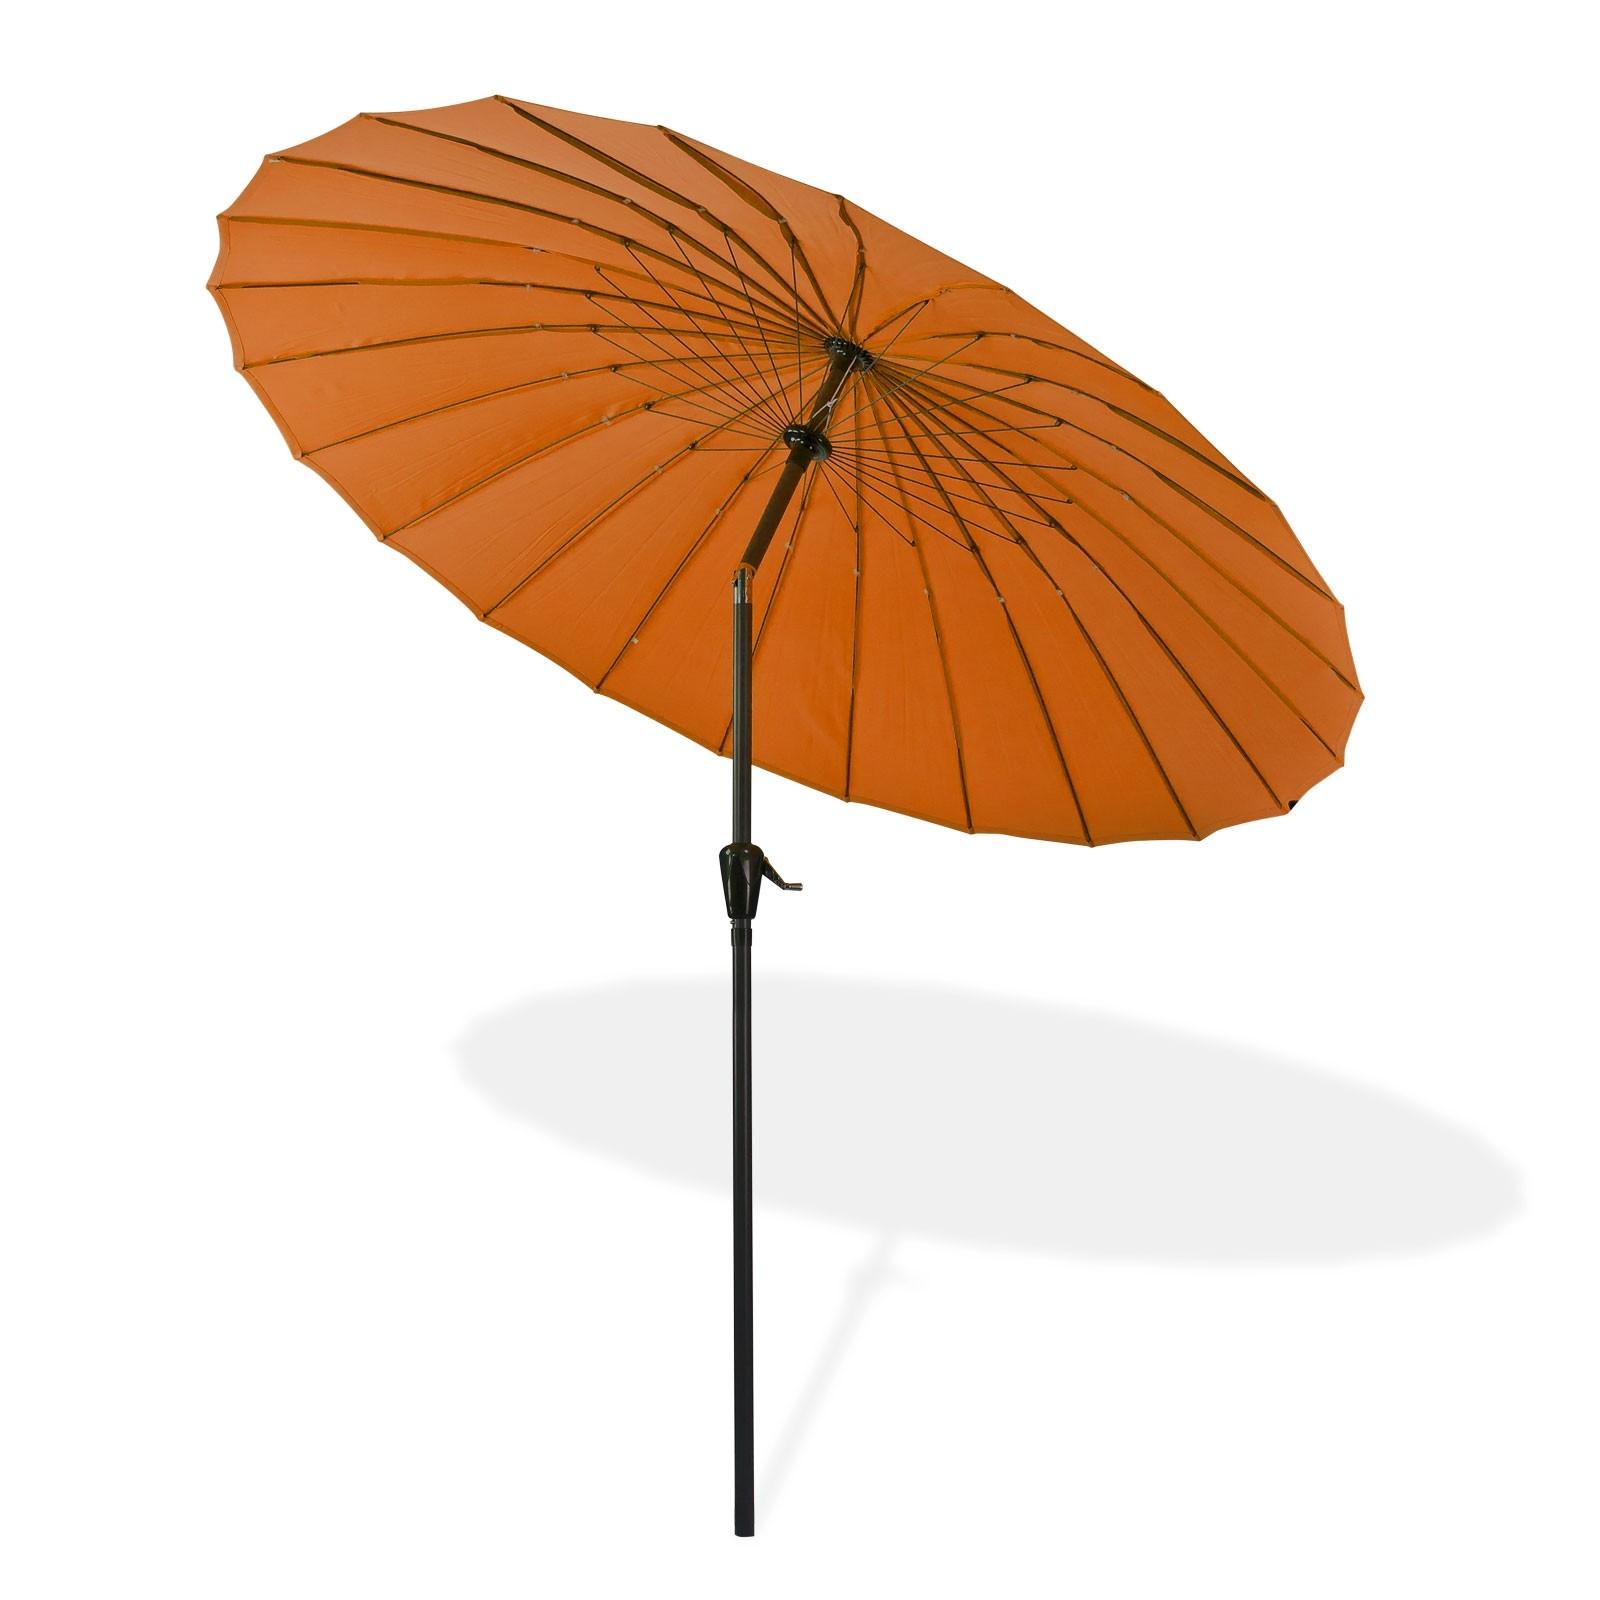 Dema Sonnenschirm Gartenschirm Sonnenschutz Schirm Kurbelschirm Tokio 2,5m terracotta 41280